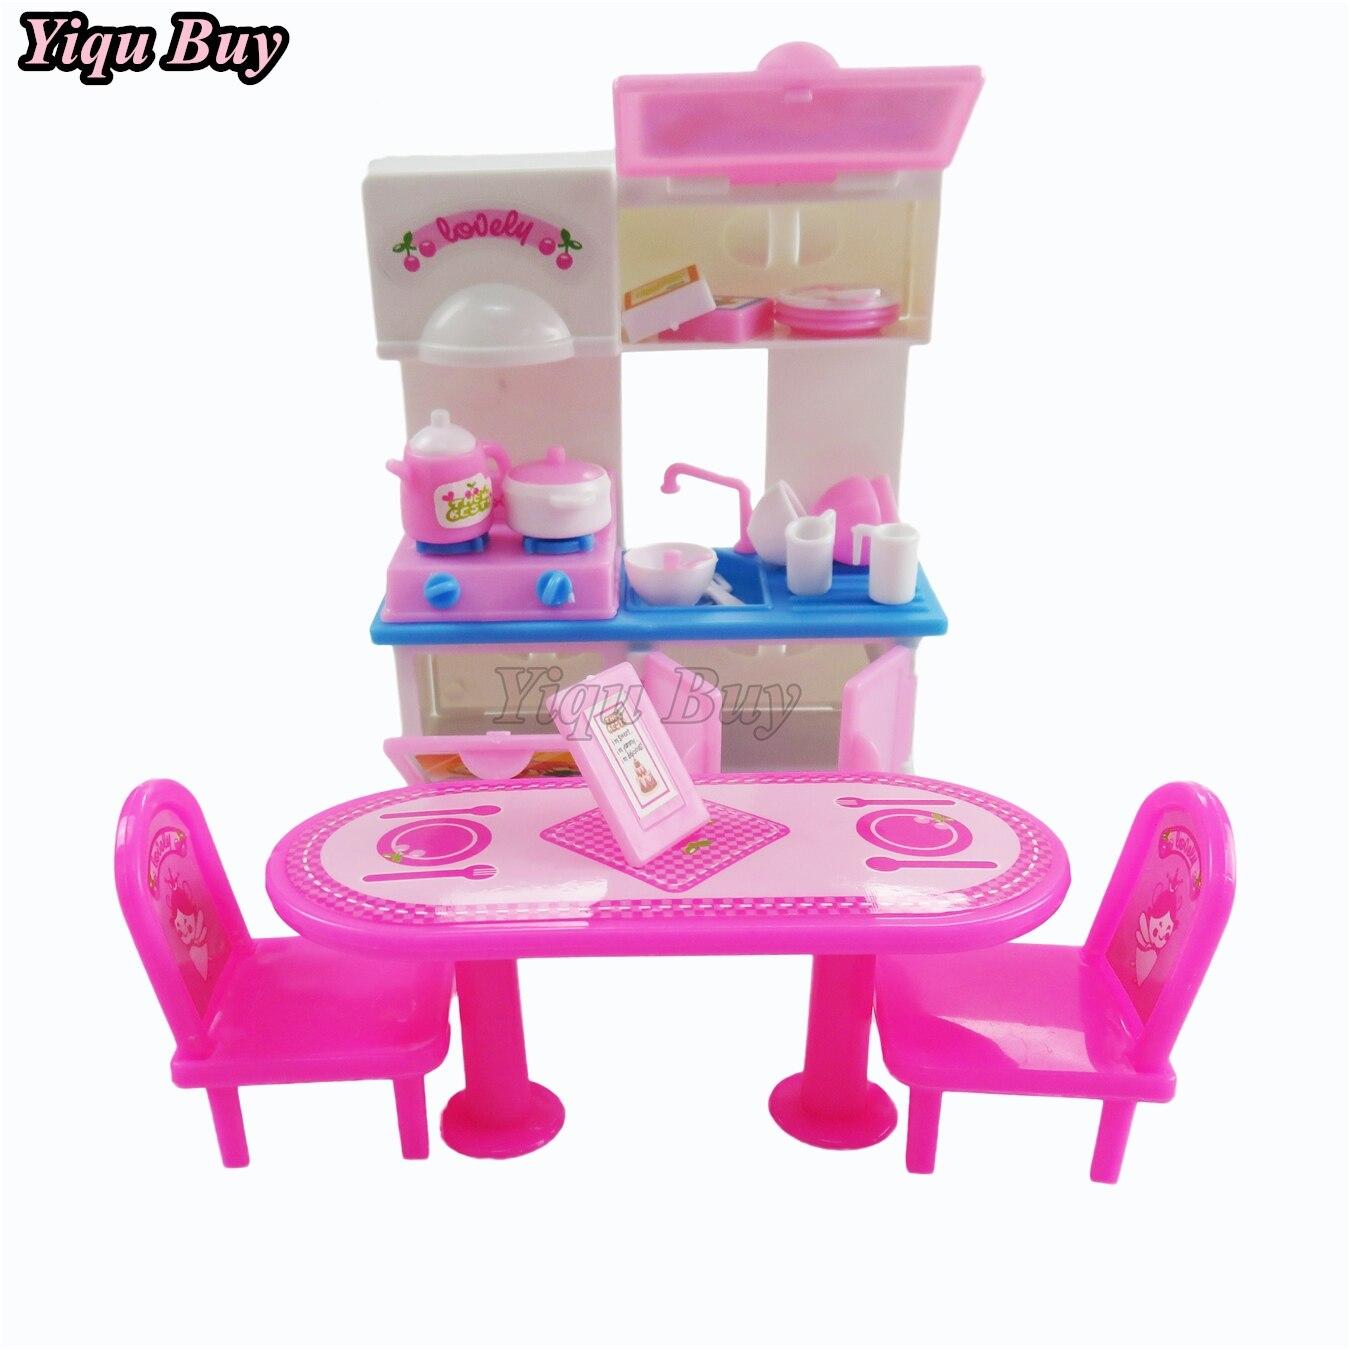 20 Pz/set Bambole Armadi Barbie Doll Accessori Per La Tavola Tavolo ...